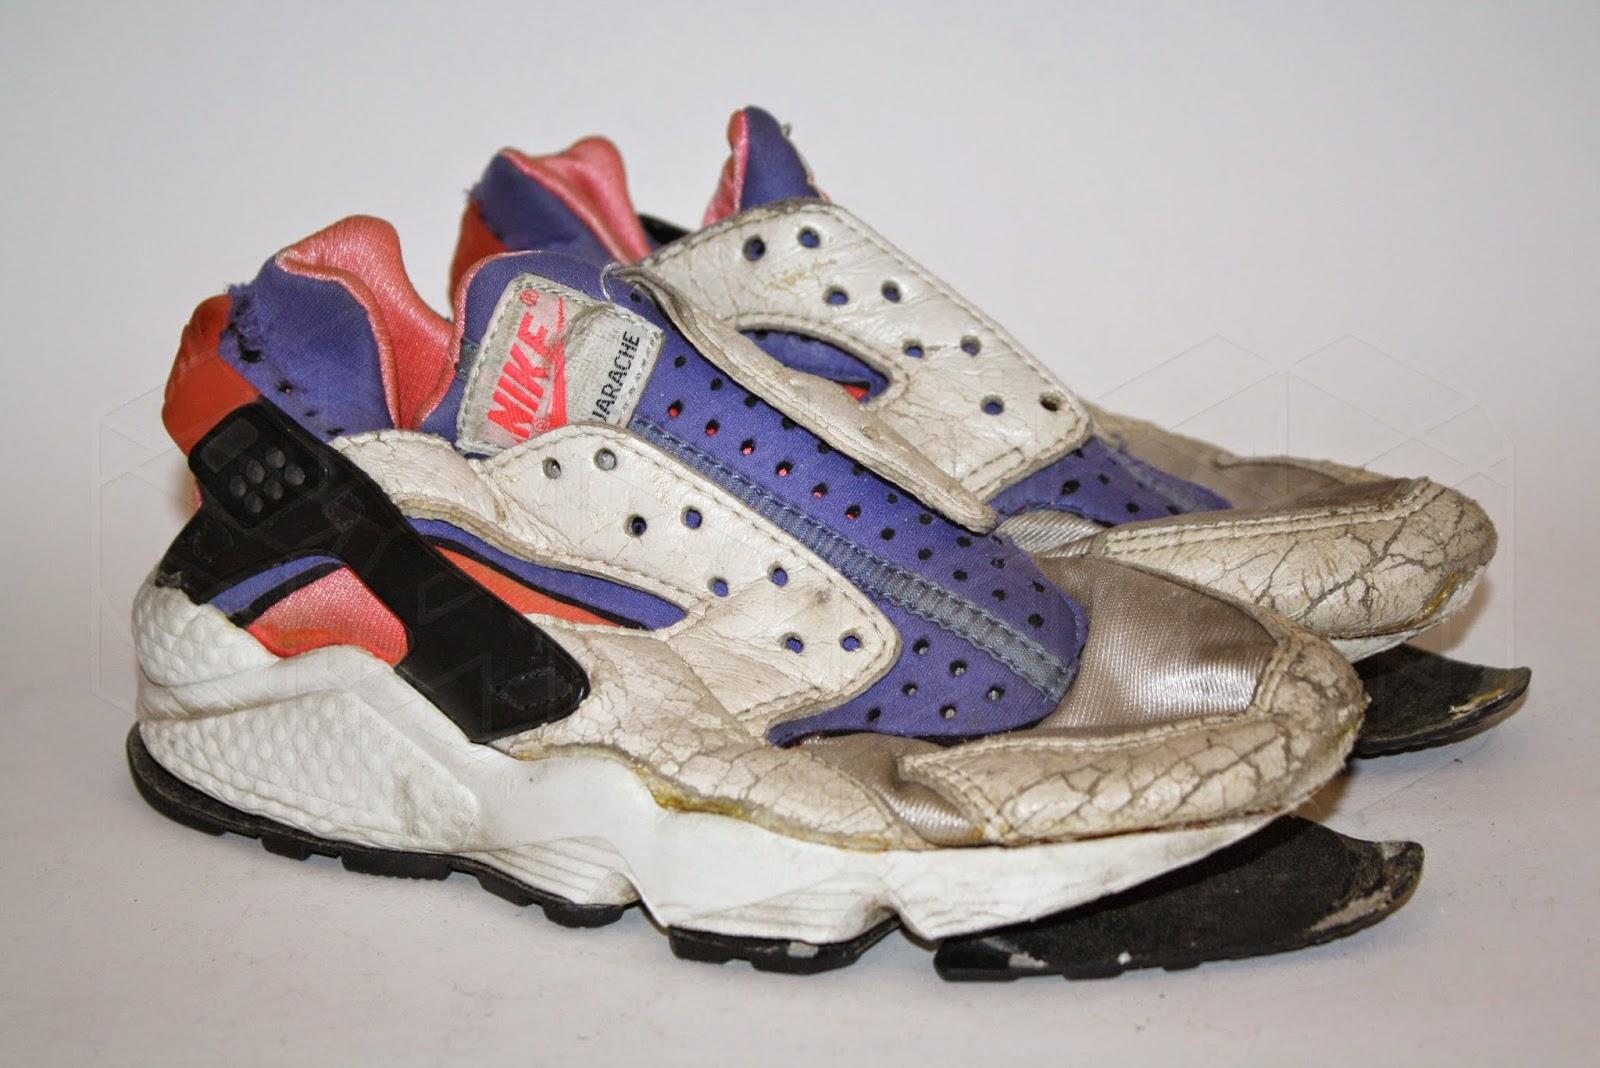 low cost usa cheap sale sold worldwide Nueve Cincuenta: Nike Air Huarache OG, Wmns Purple/ Bright ...